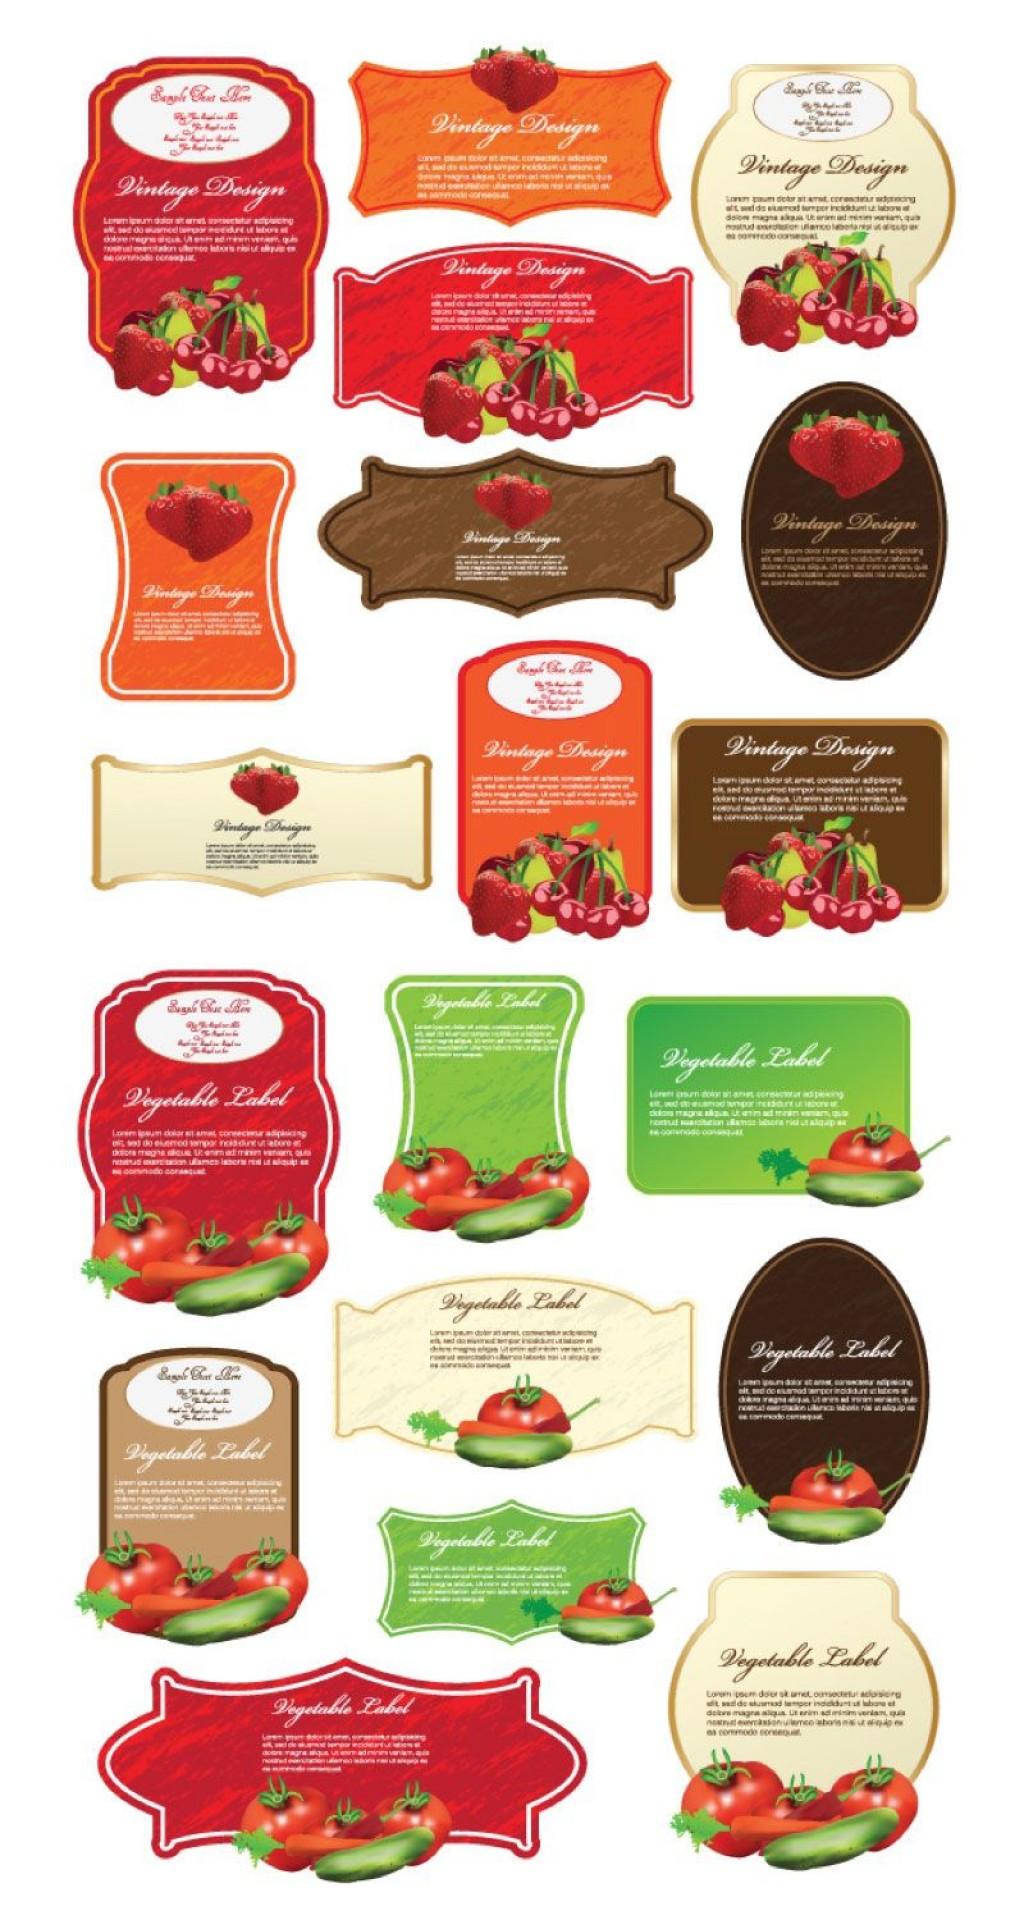 008 Unique Free Food Label Design Template Highest Quality  Templates DownloadLarge